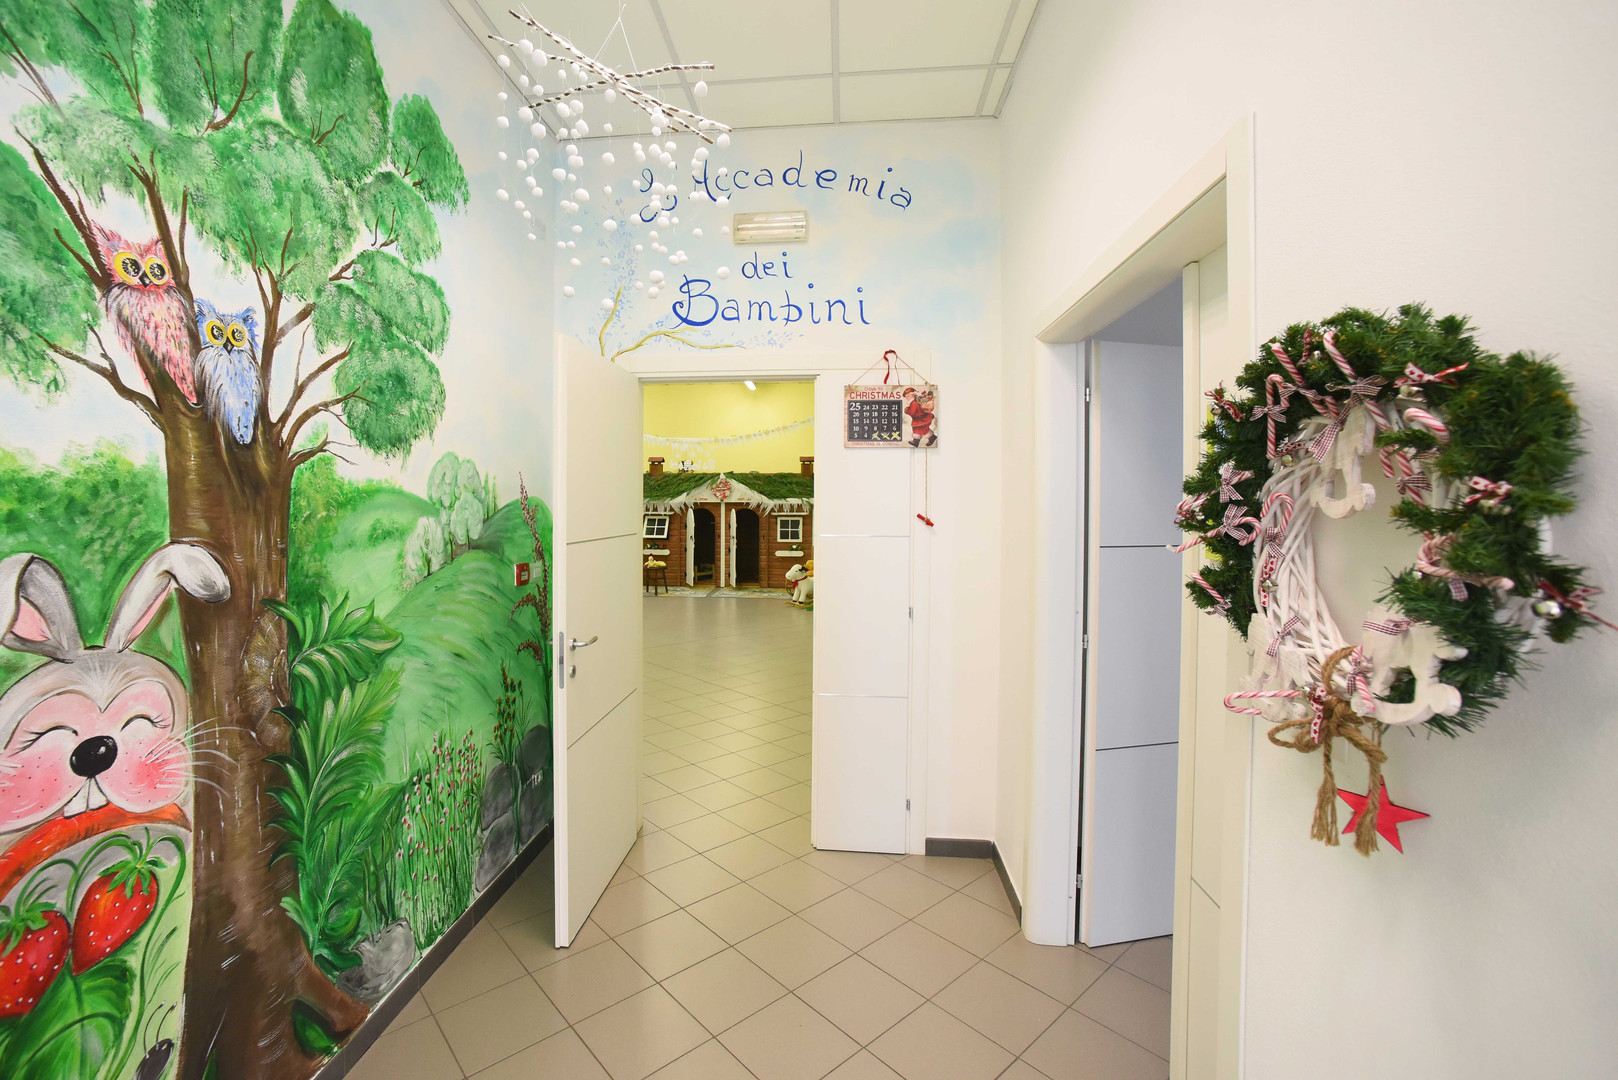 L'Accademia-dei-Bambini-Vigevano - ingre